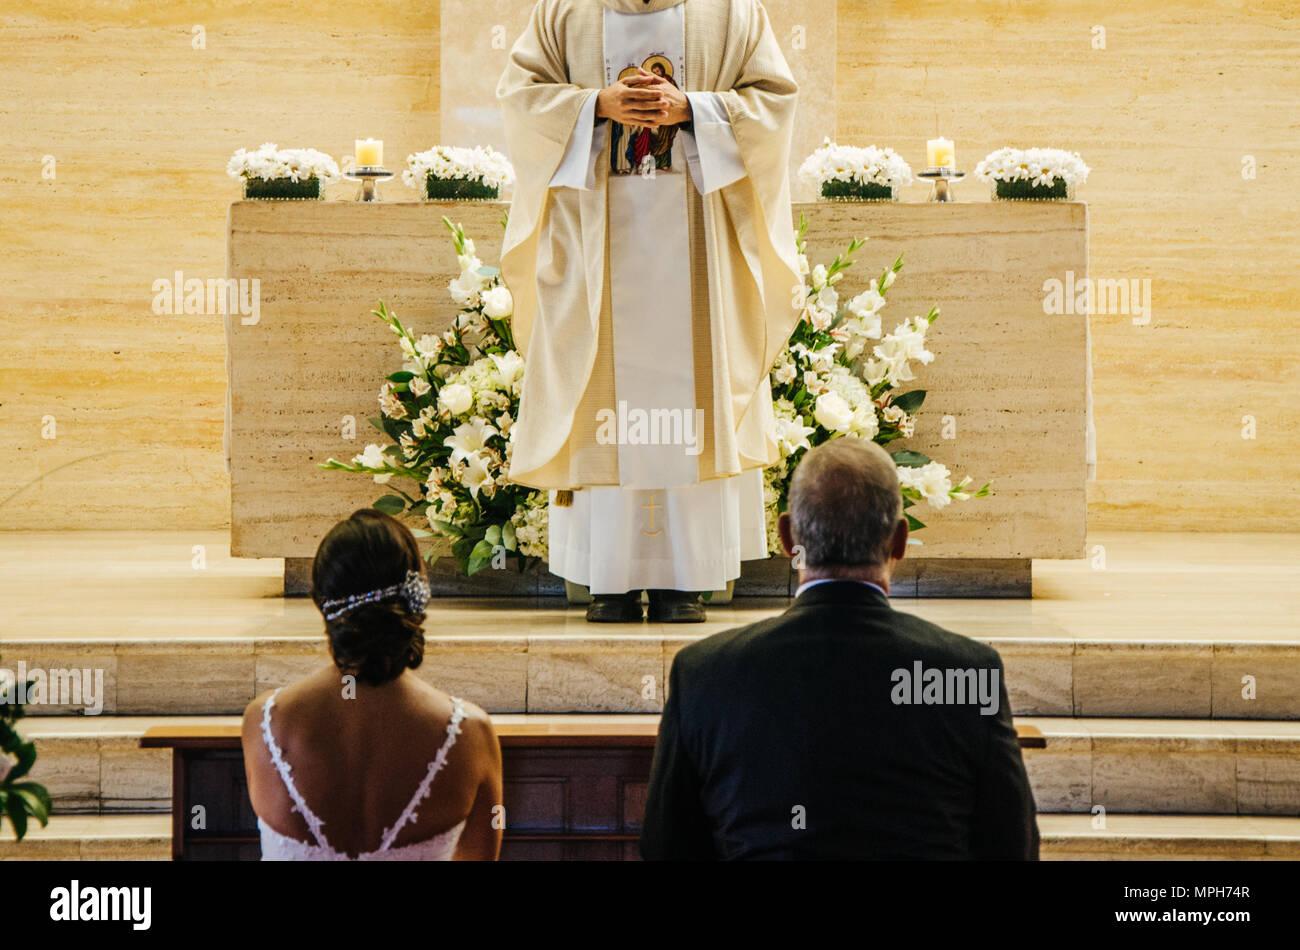 Bride Groom Altar Stock Photos & Bride Groom Altar Stock Images - Alamy